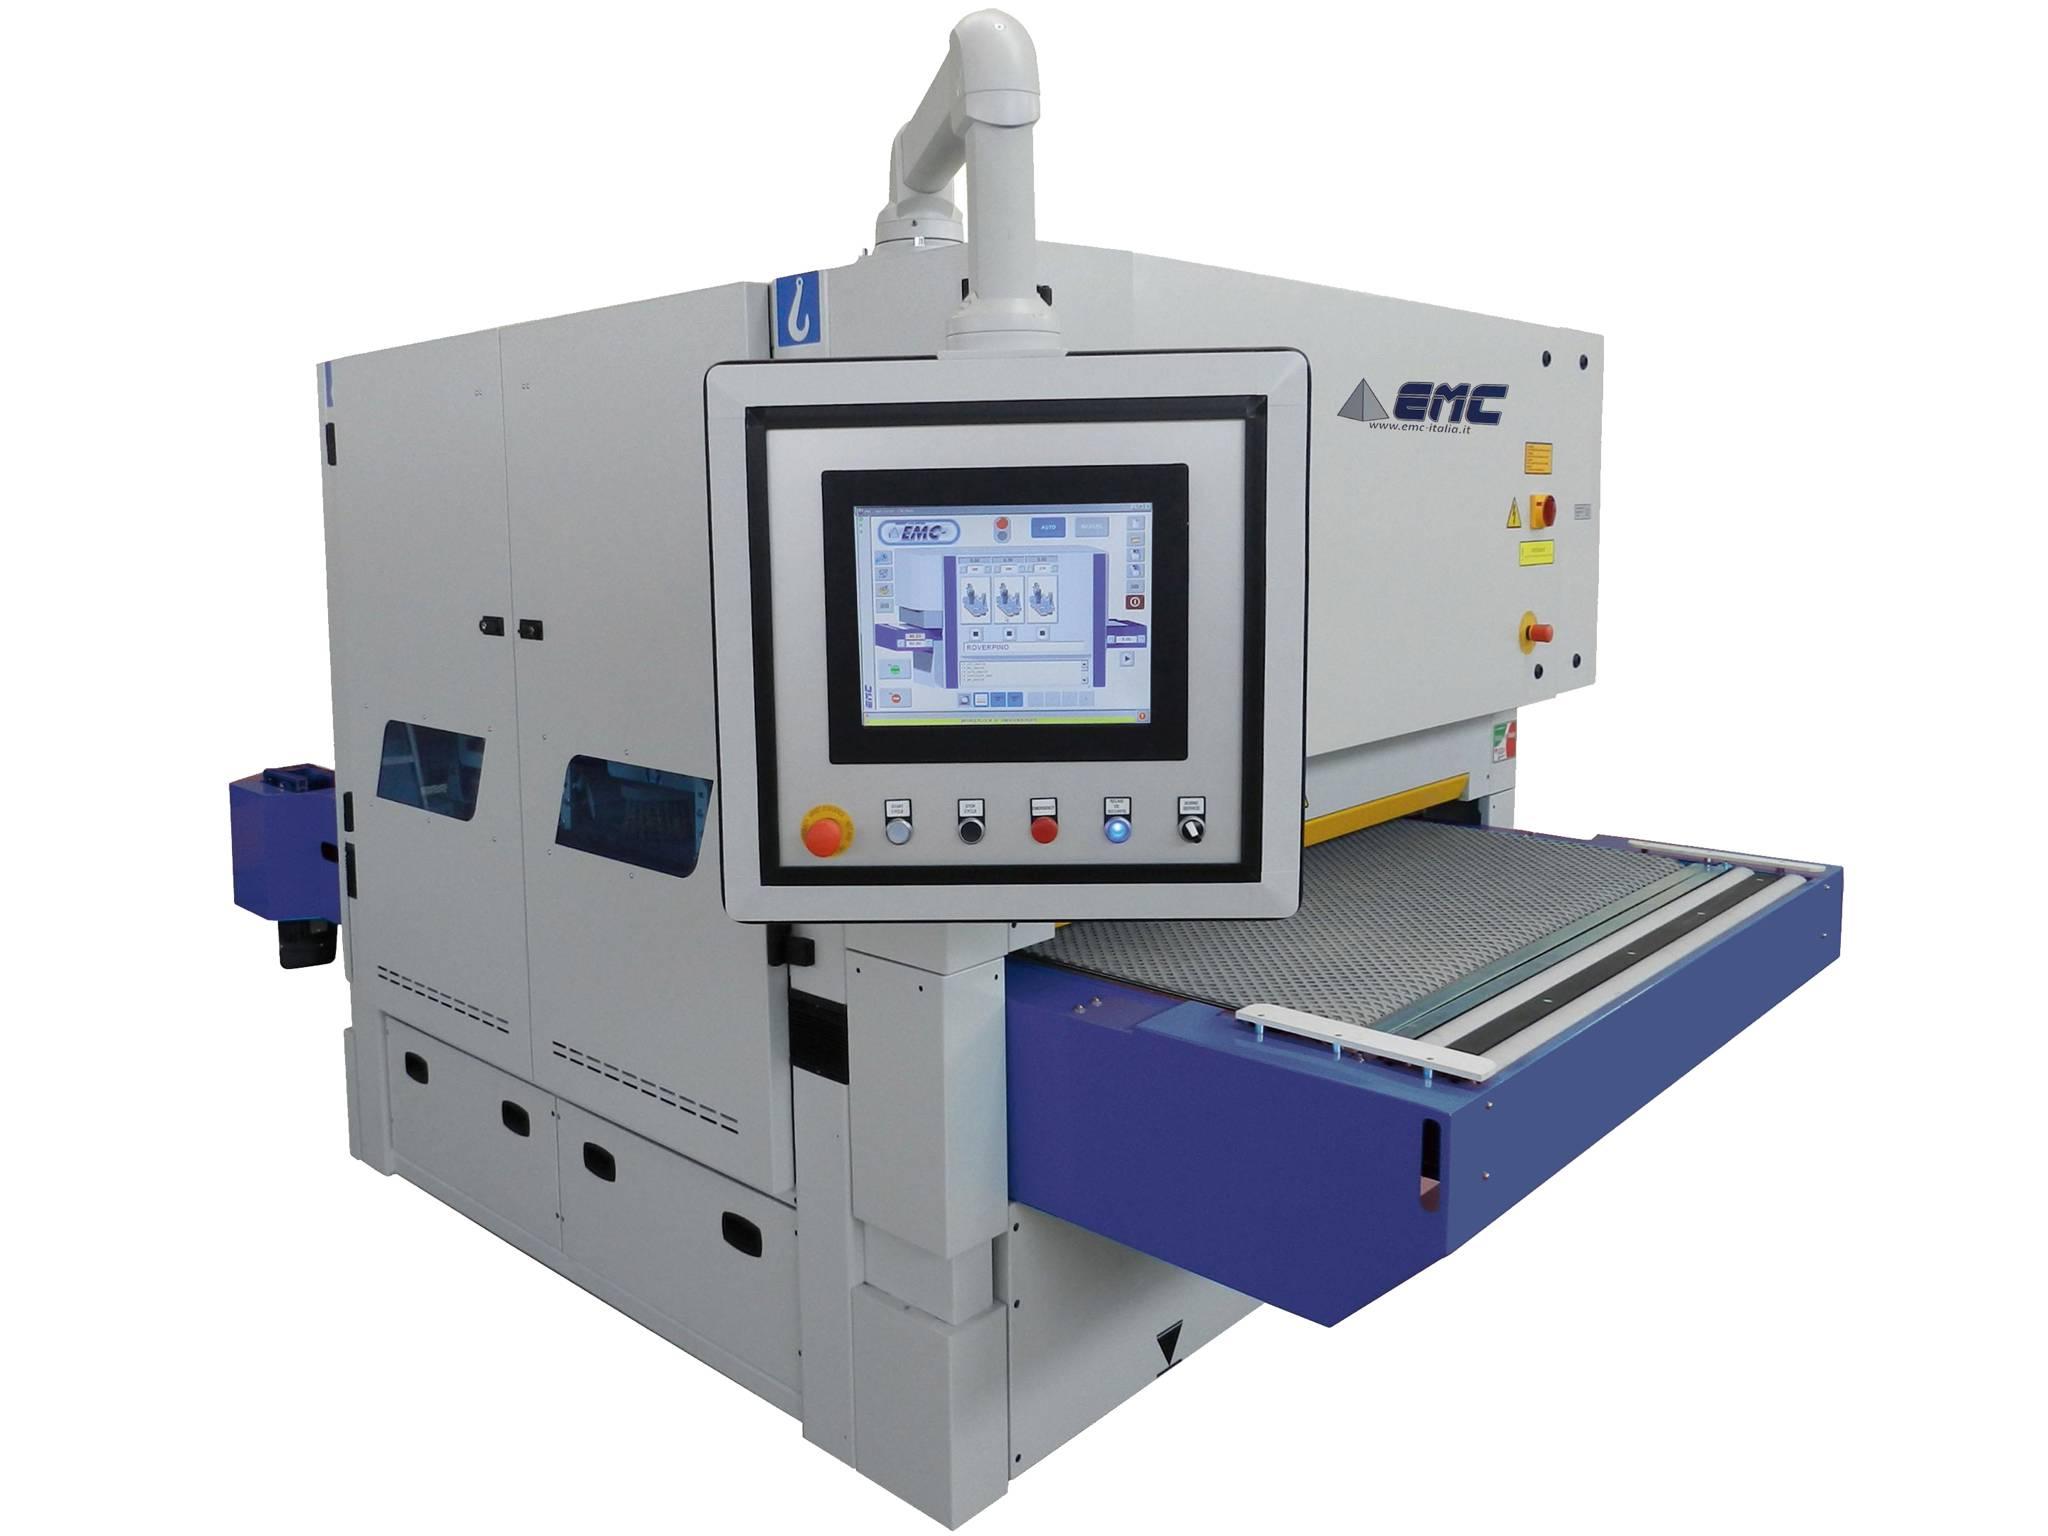 EMC | Rustic 1350